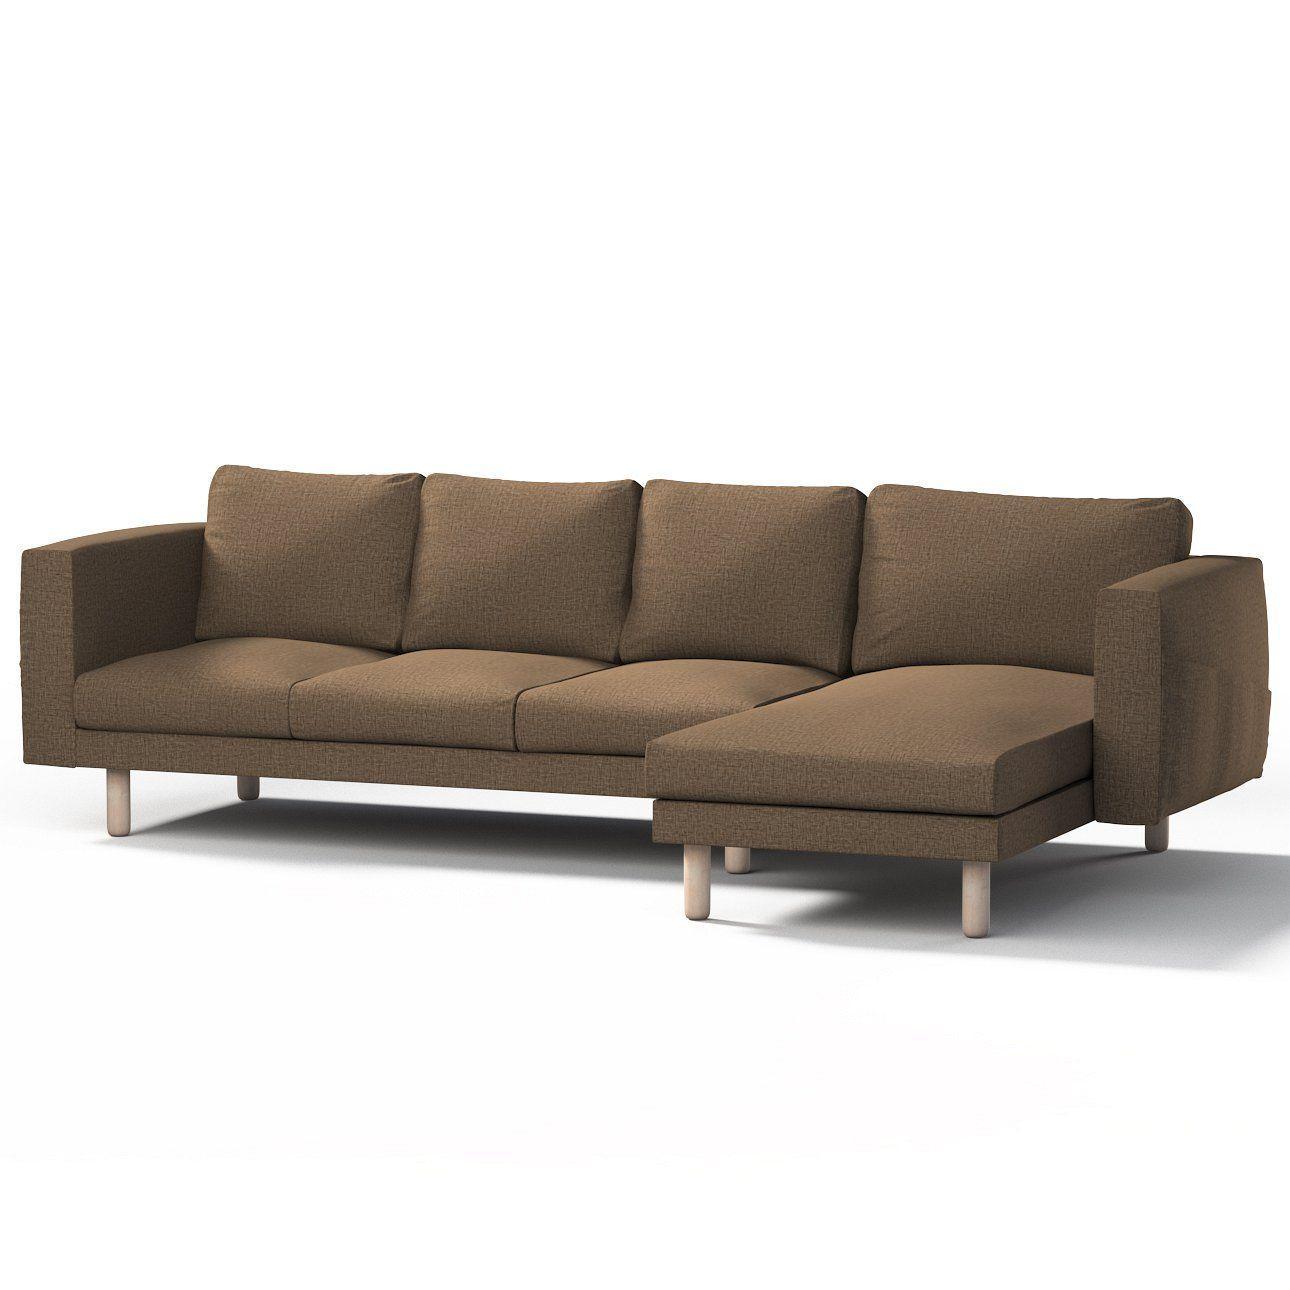 Sofa Recamiere Beige